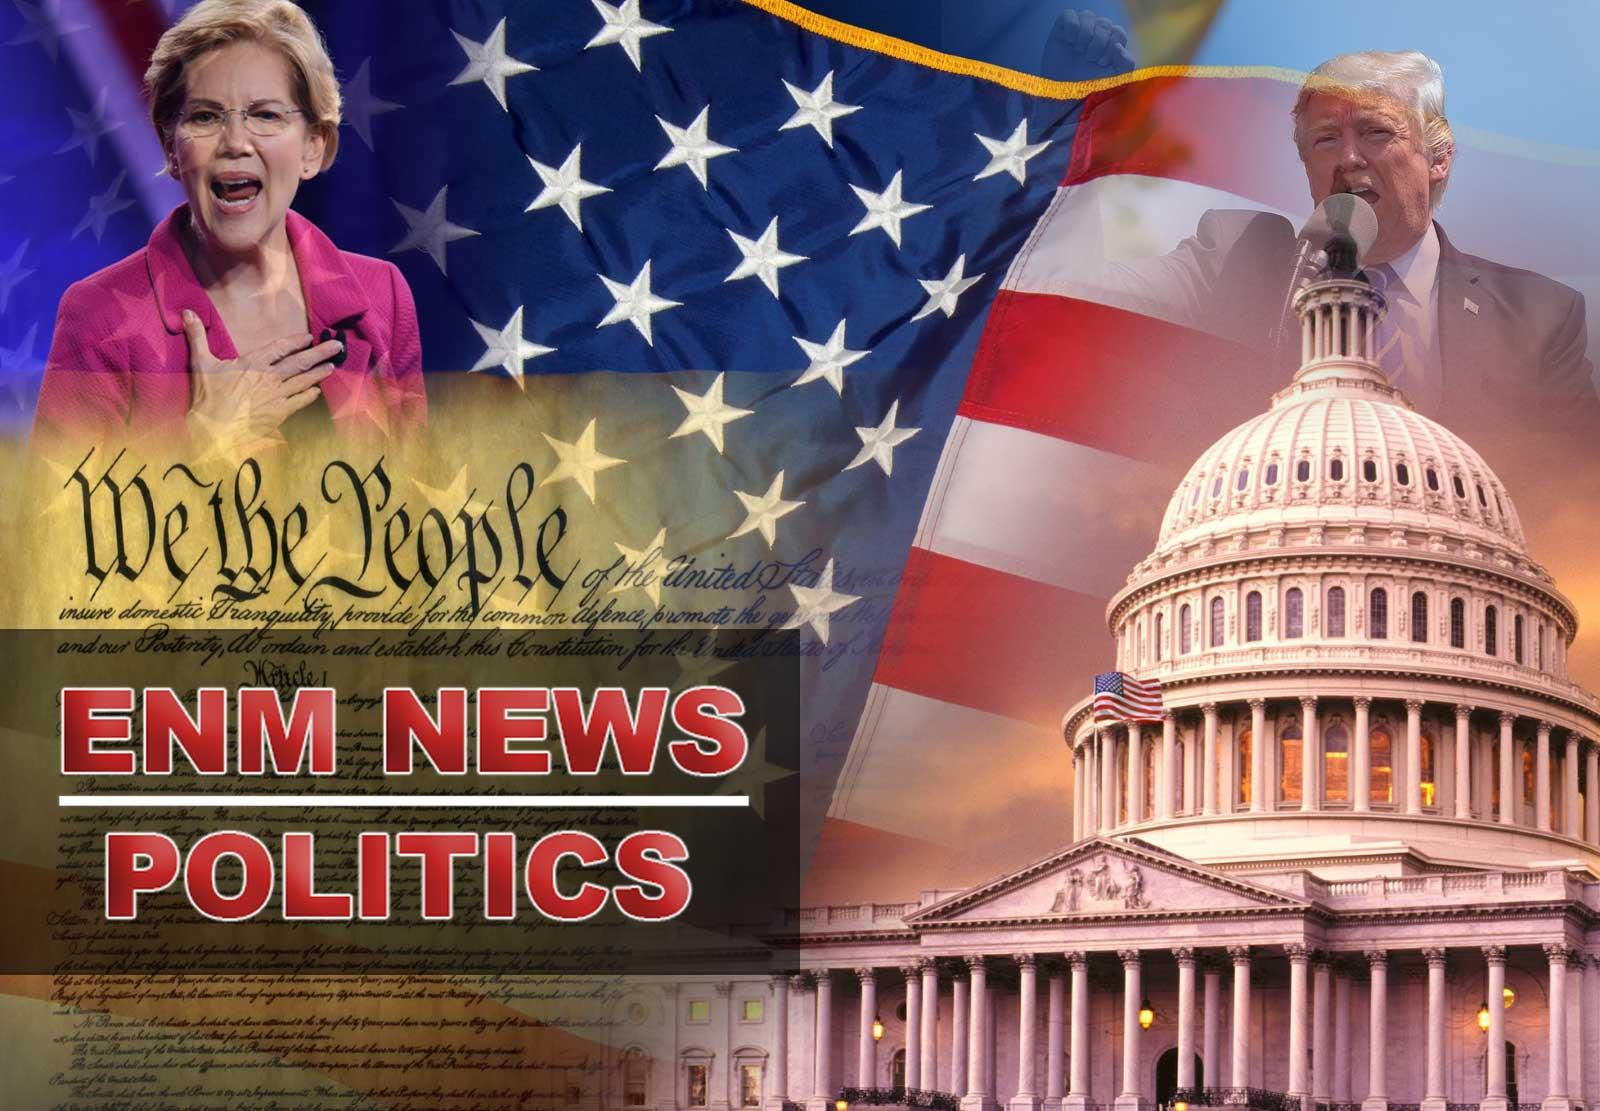 Federal court restores DACA after Supreme Court ruling